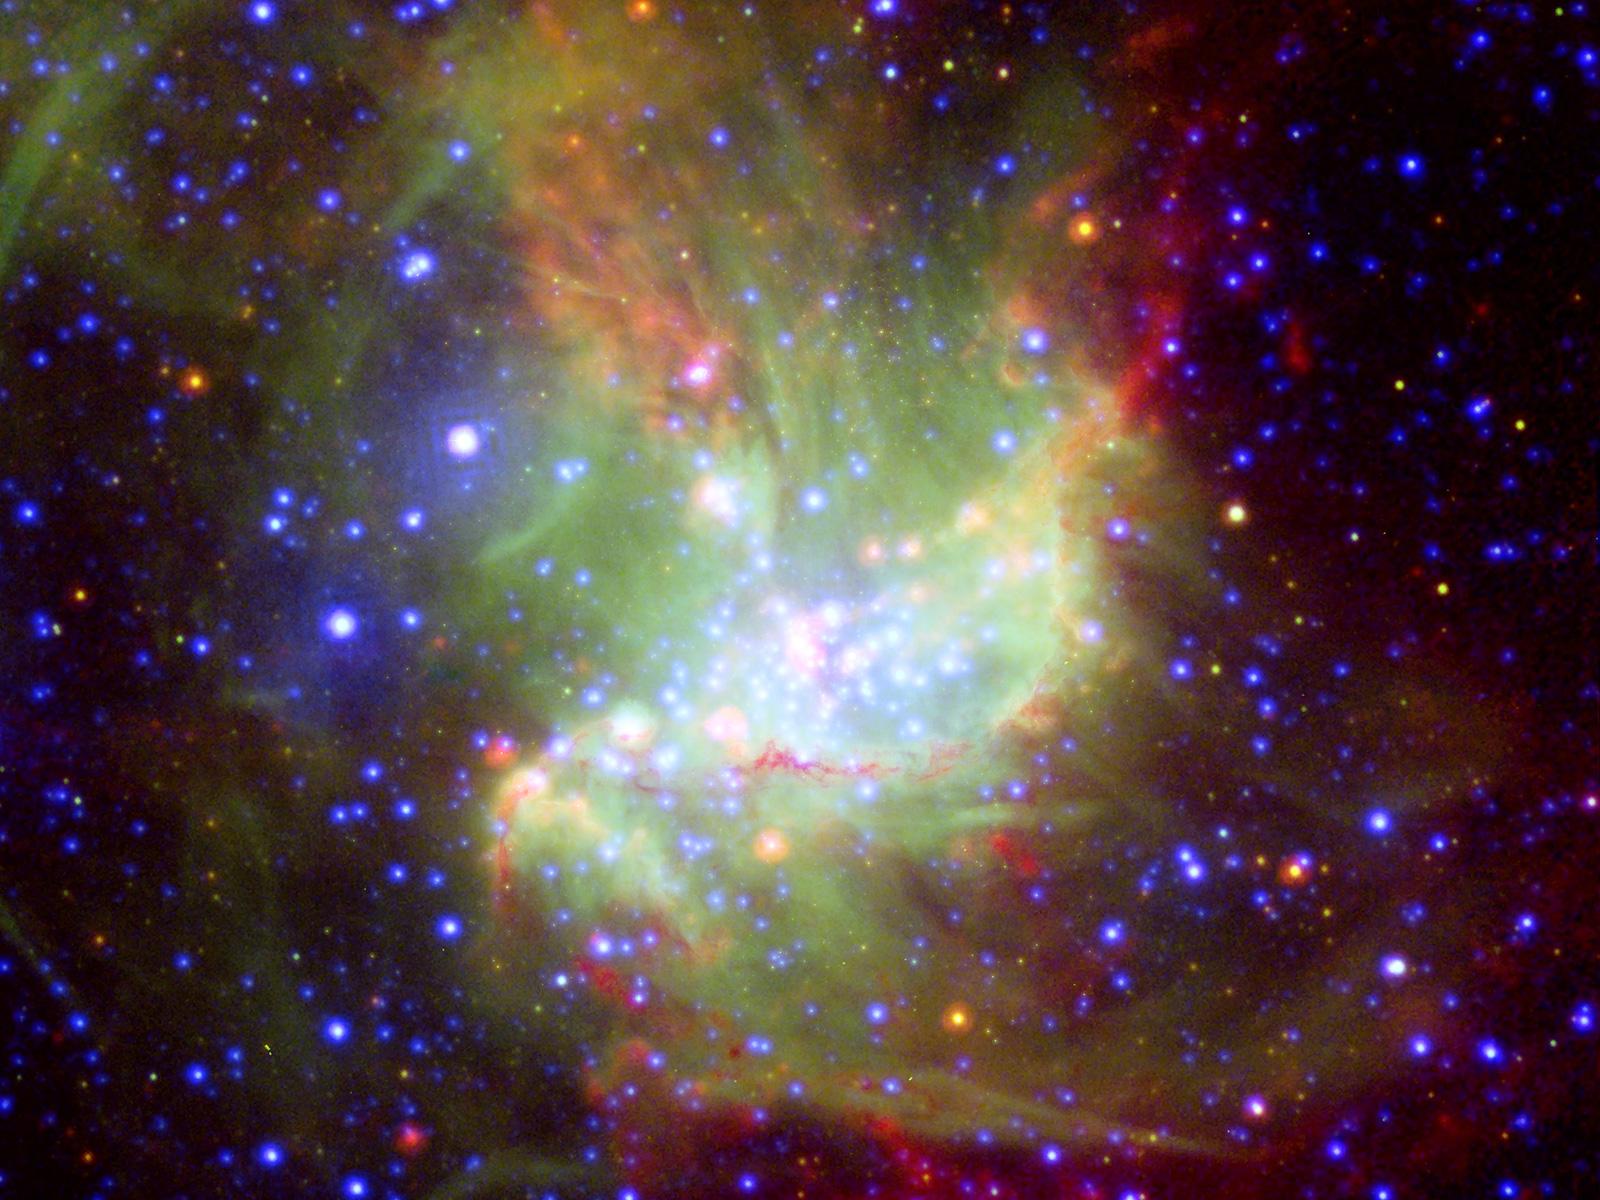 Star-Forming Region NGC 346 1600